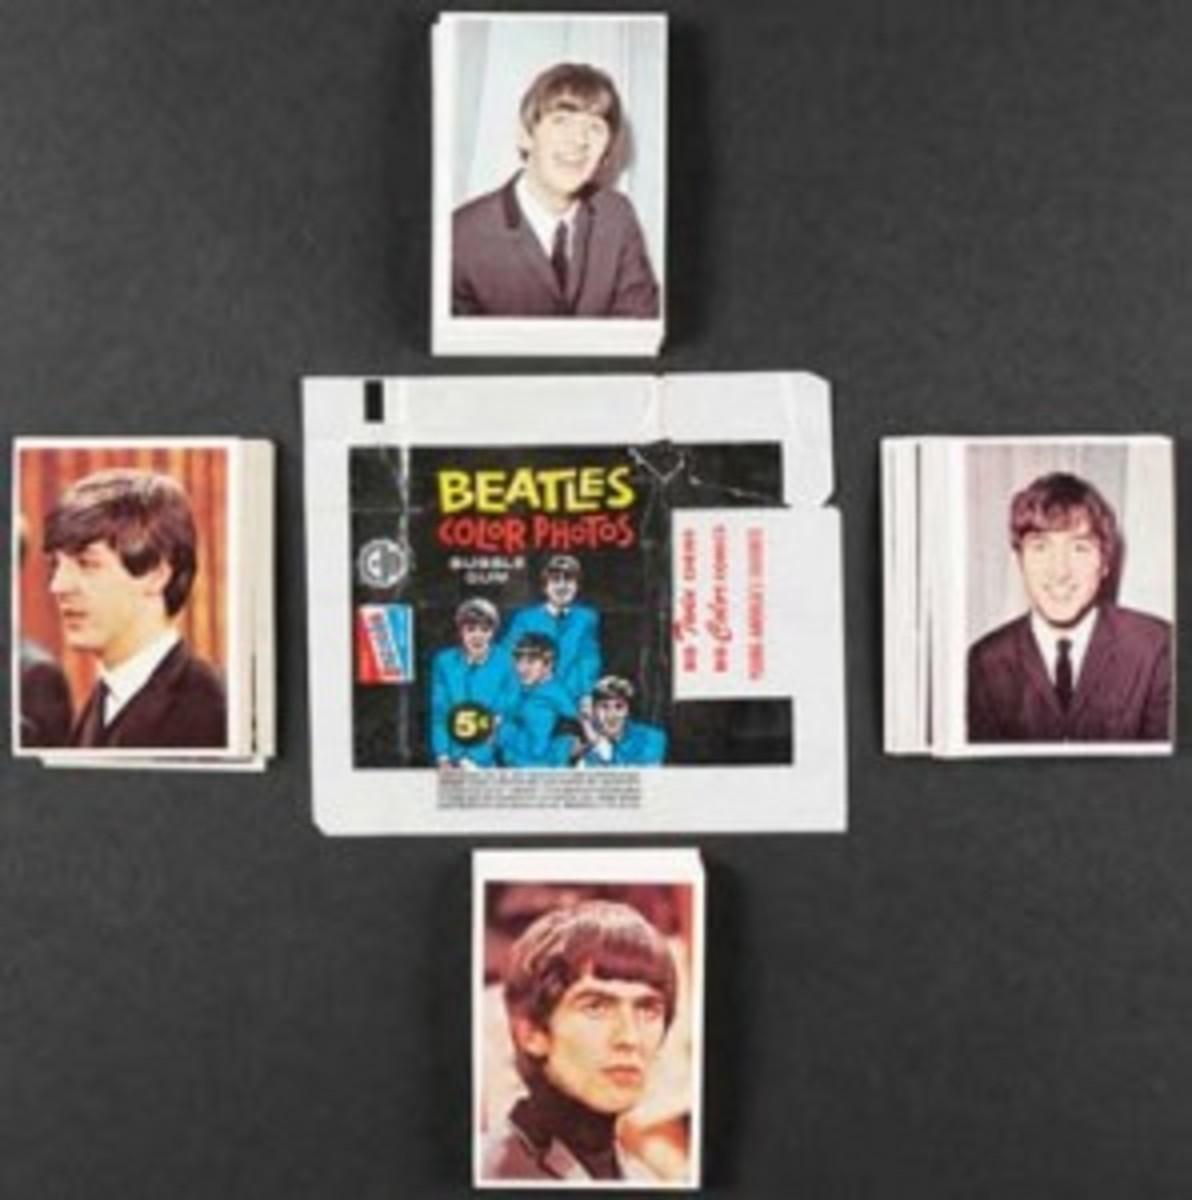 BeatlesCards